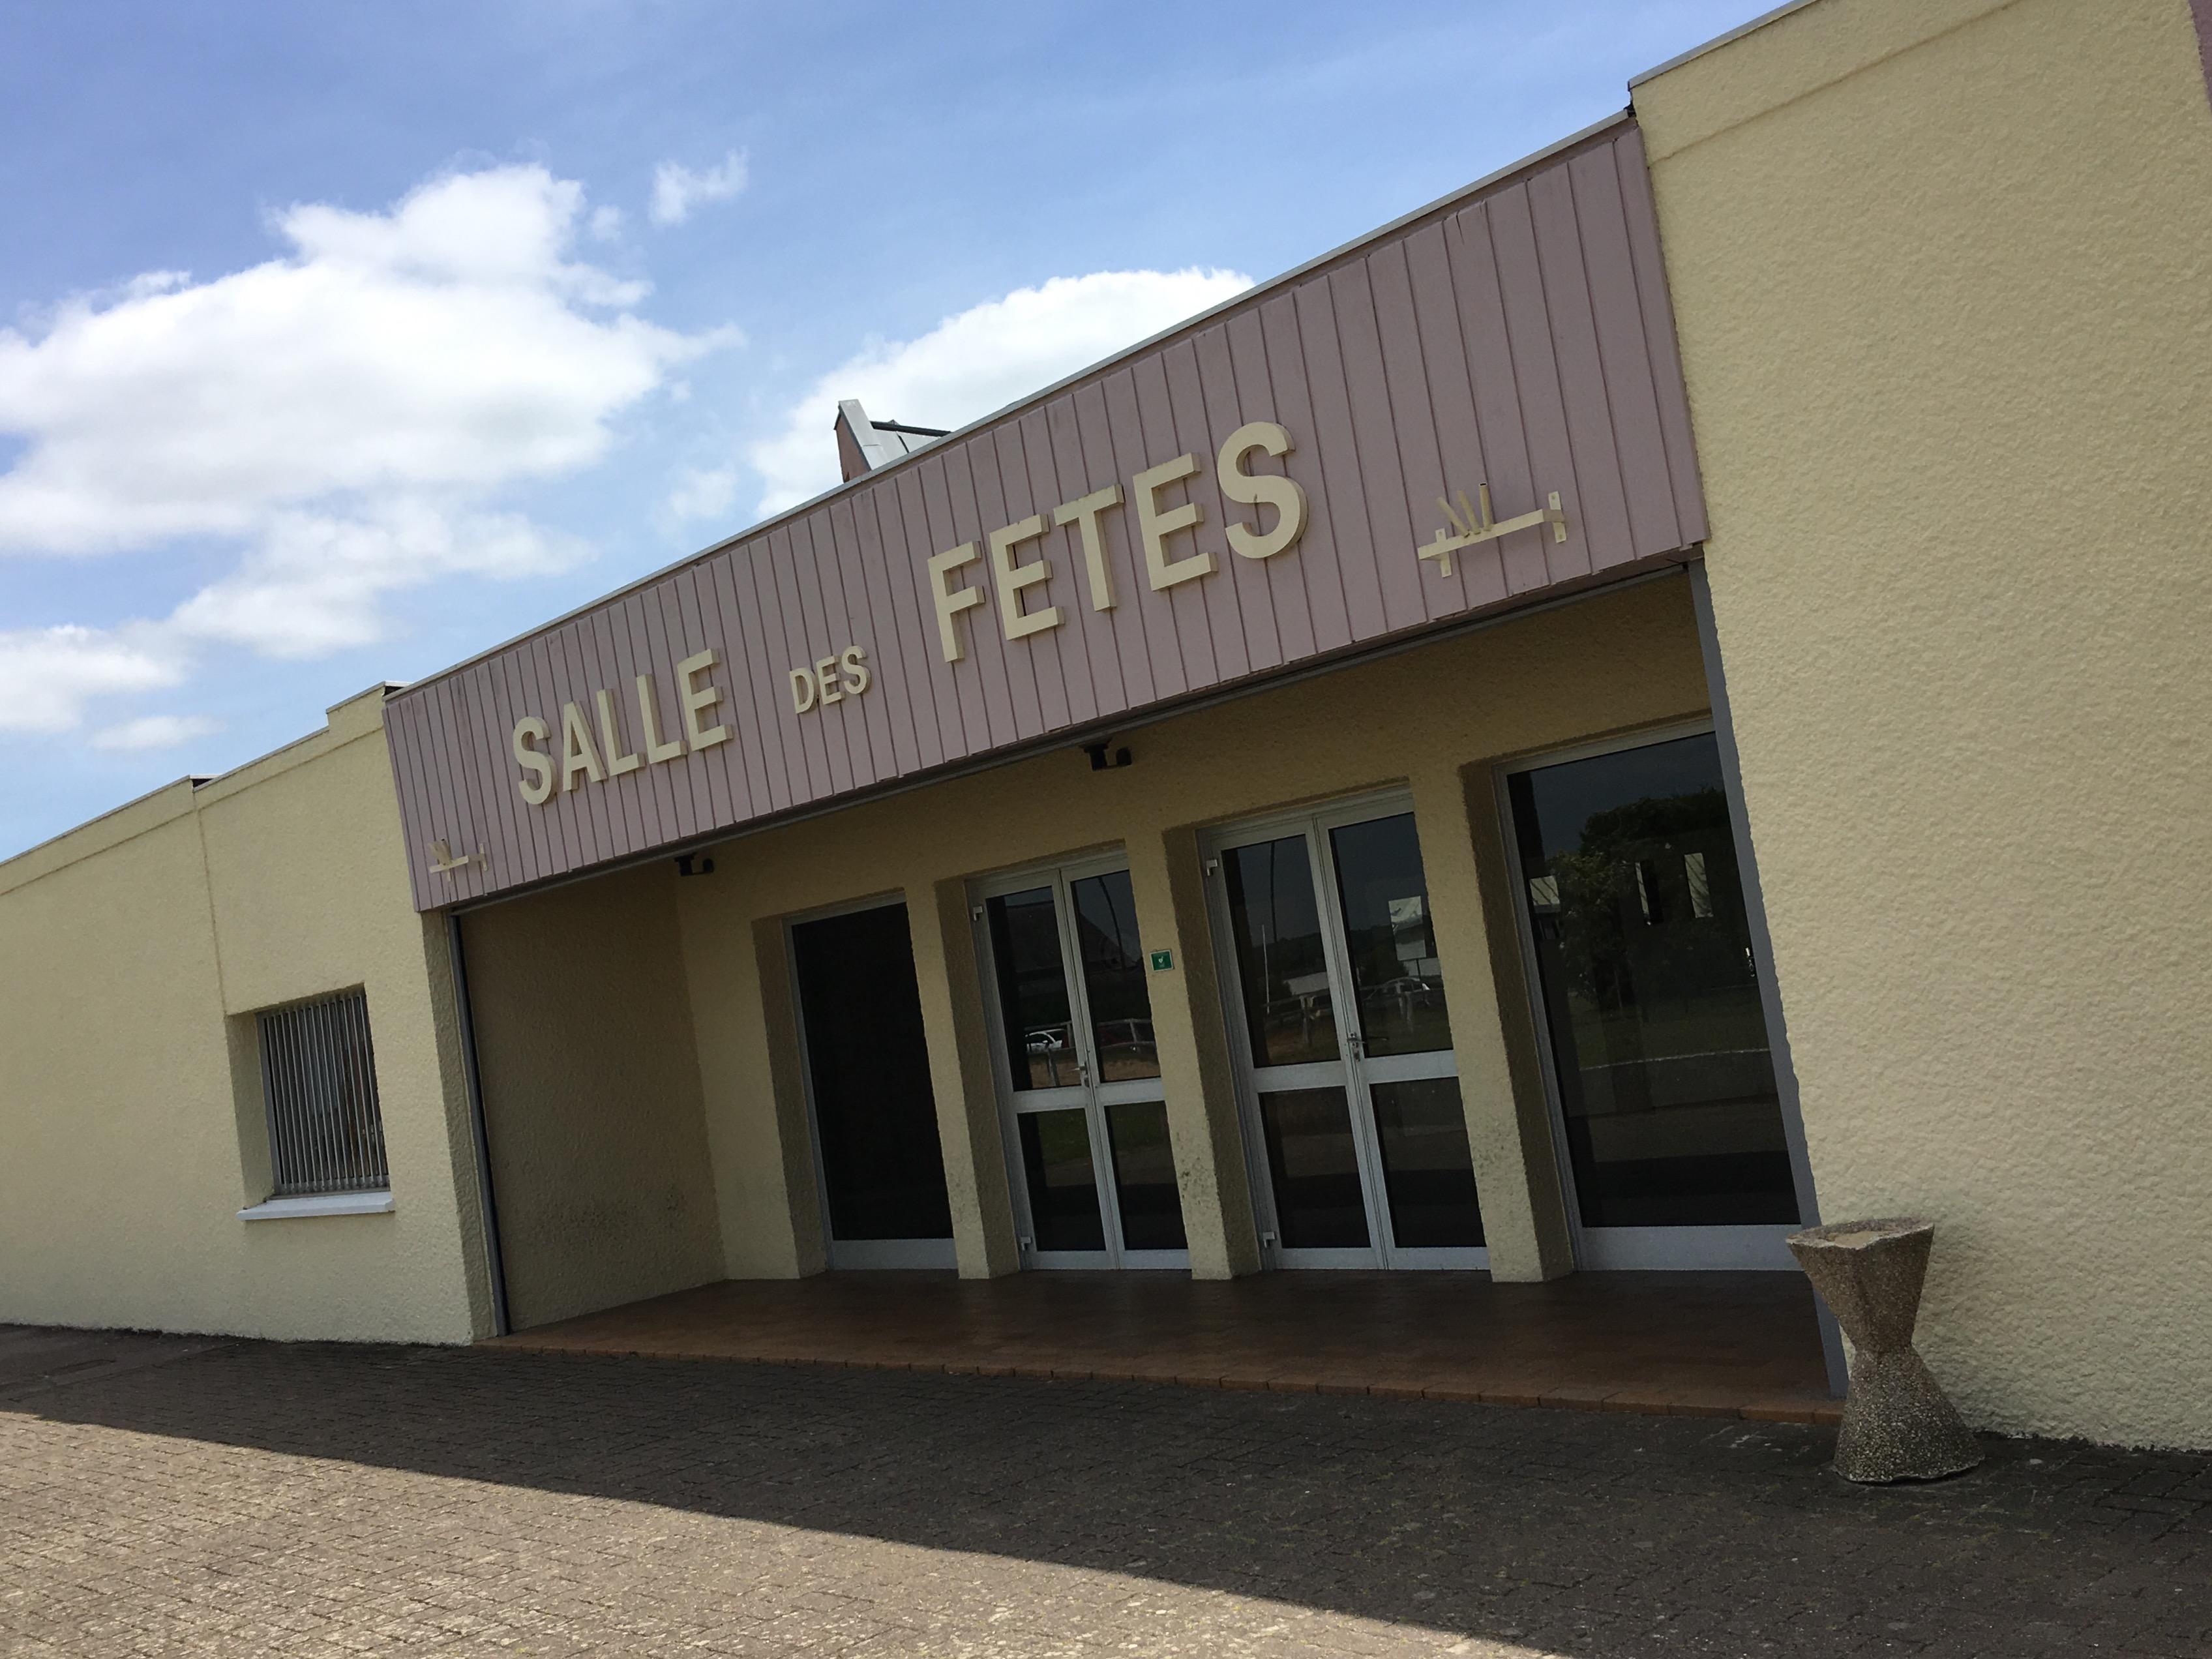 Salle_des_fêtes